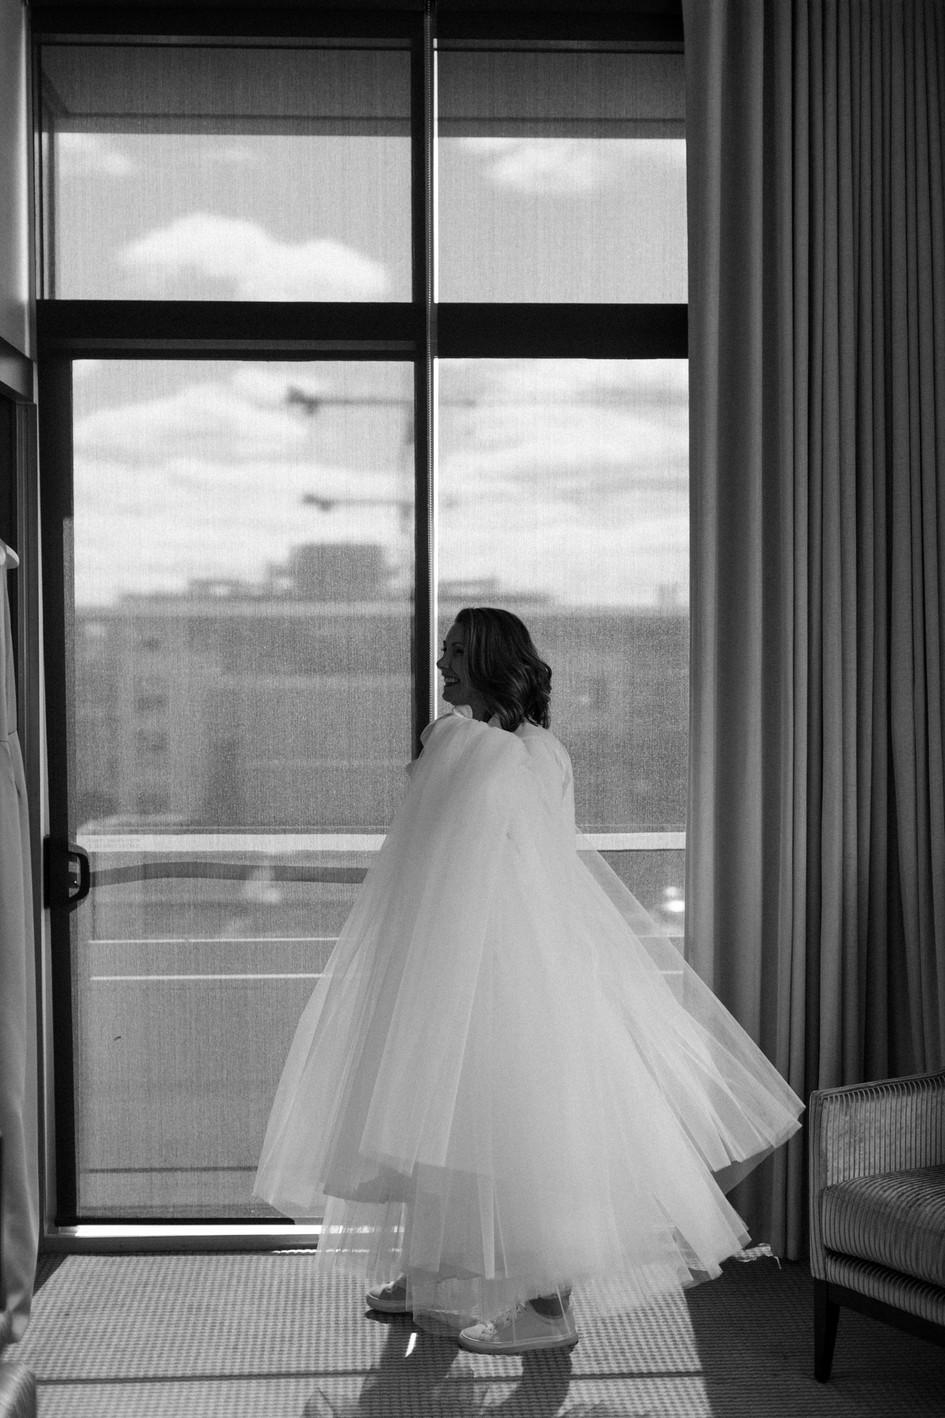 wedding_dress.jpg